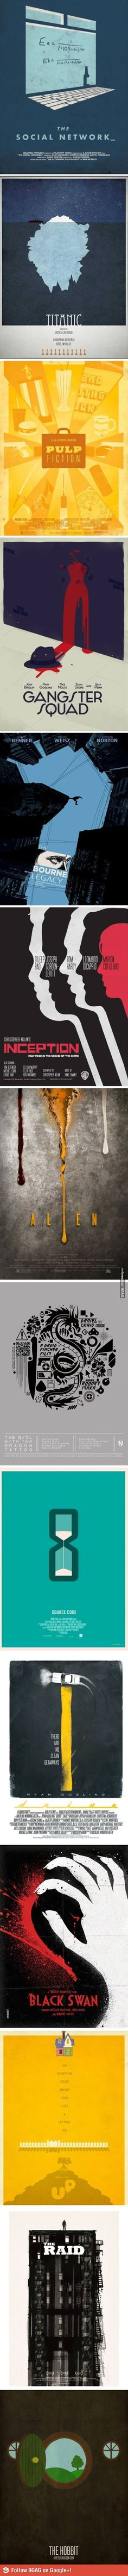 Creative alternate movie posters